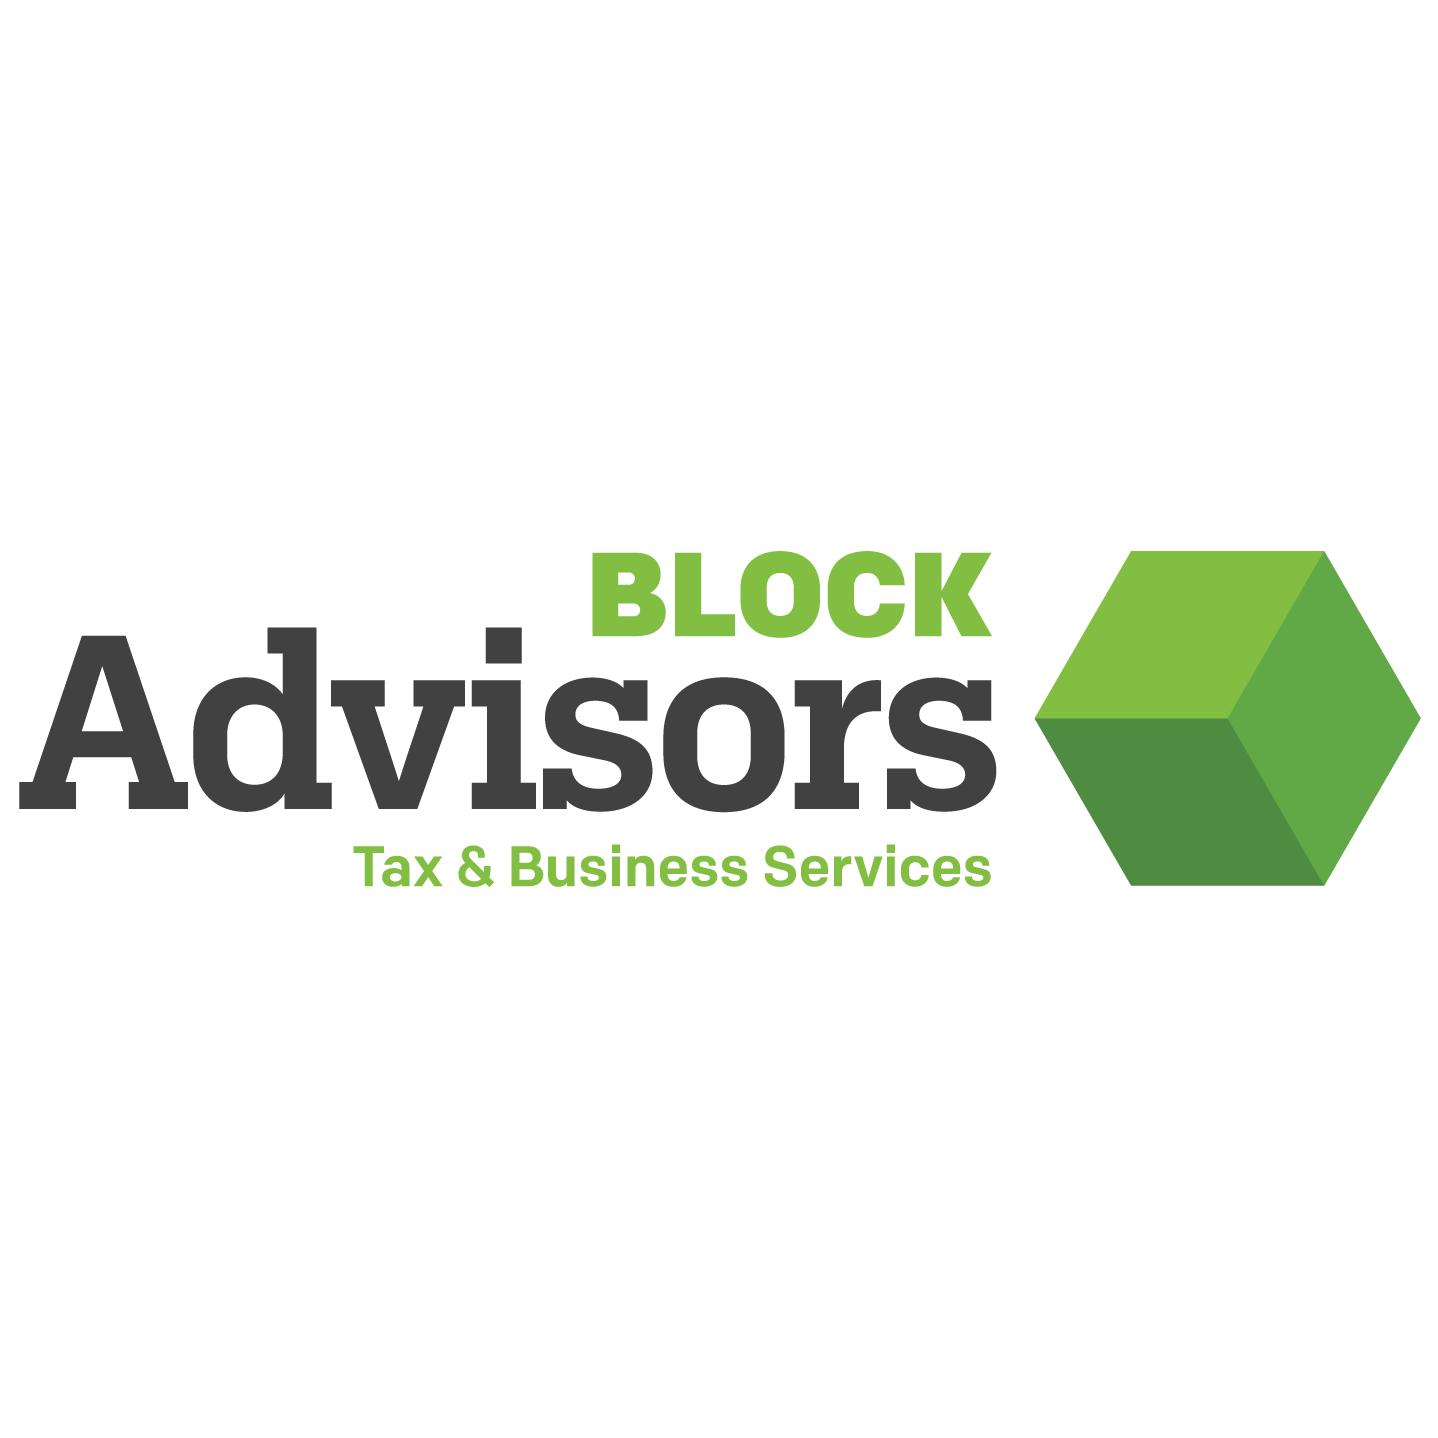 Block Advisors - Katy, TX 77494 - (281)670-0975 | ShowMeLocal.com